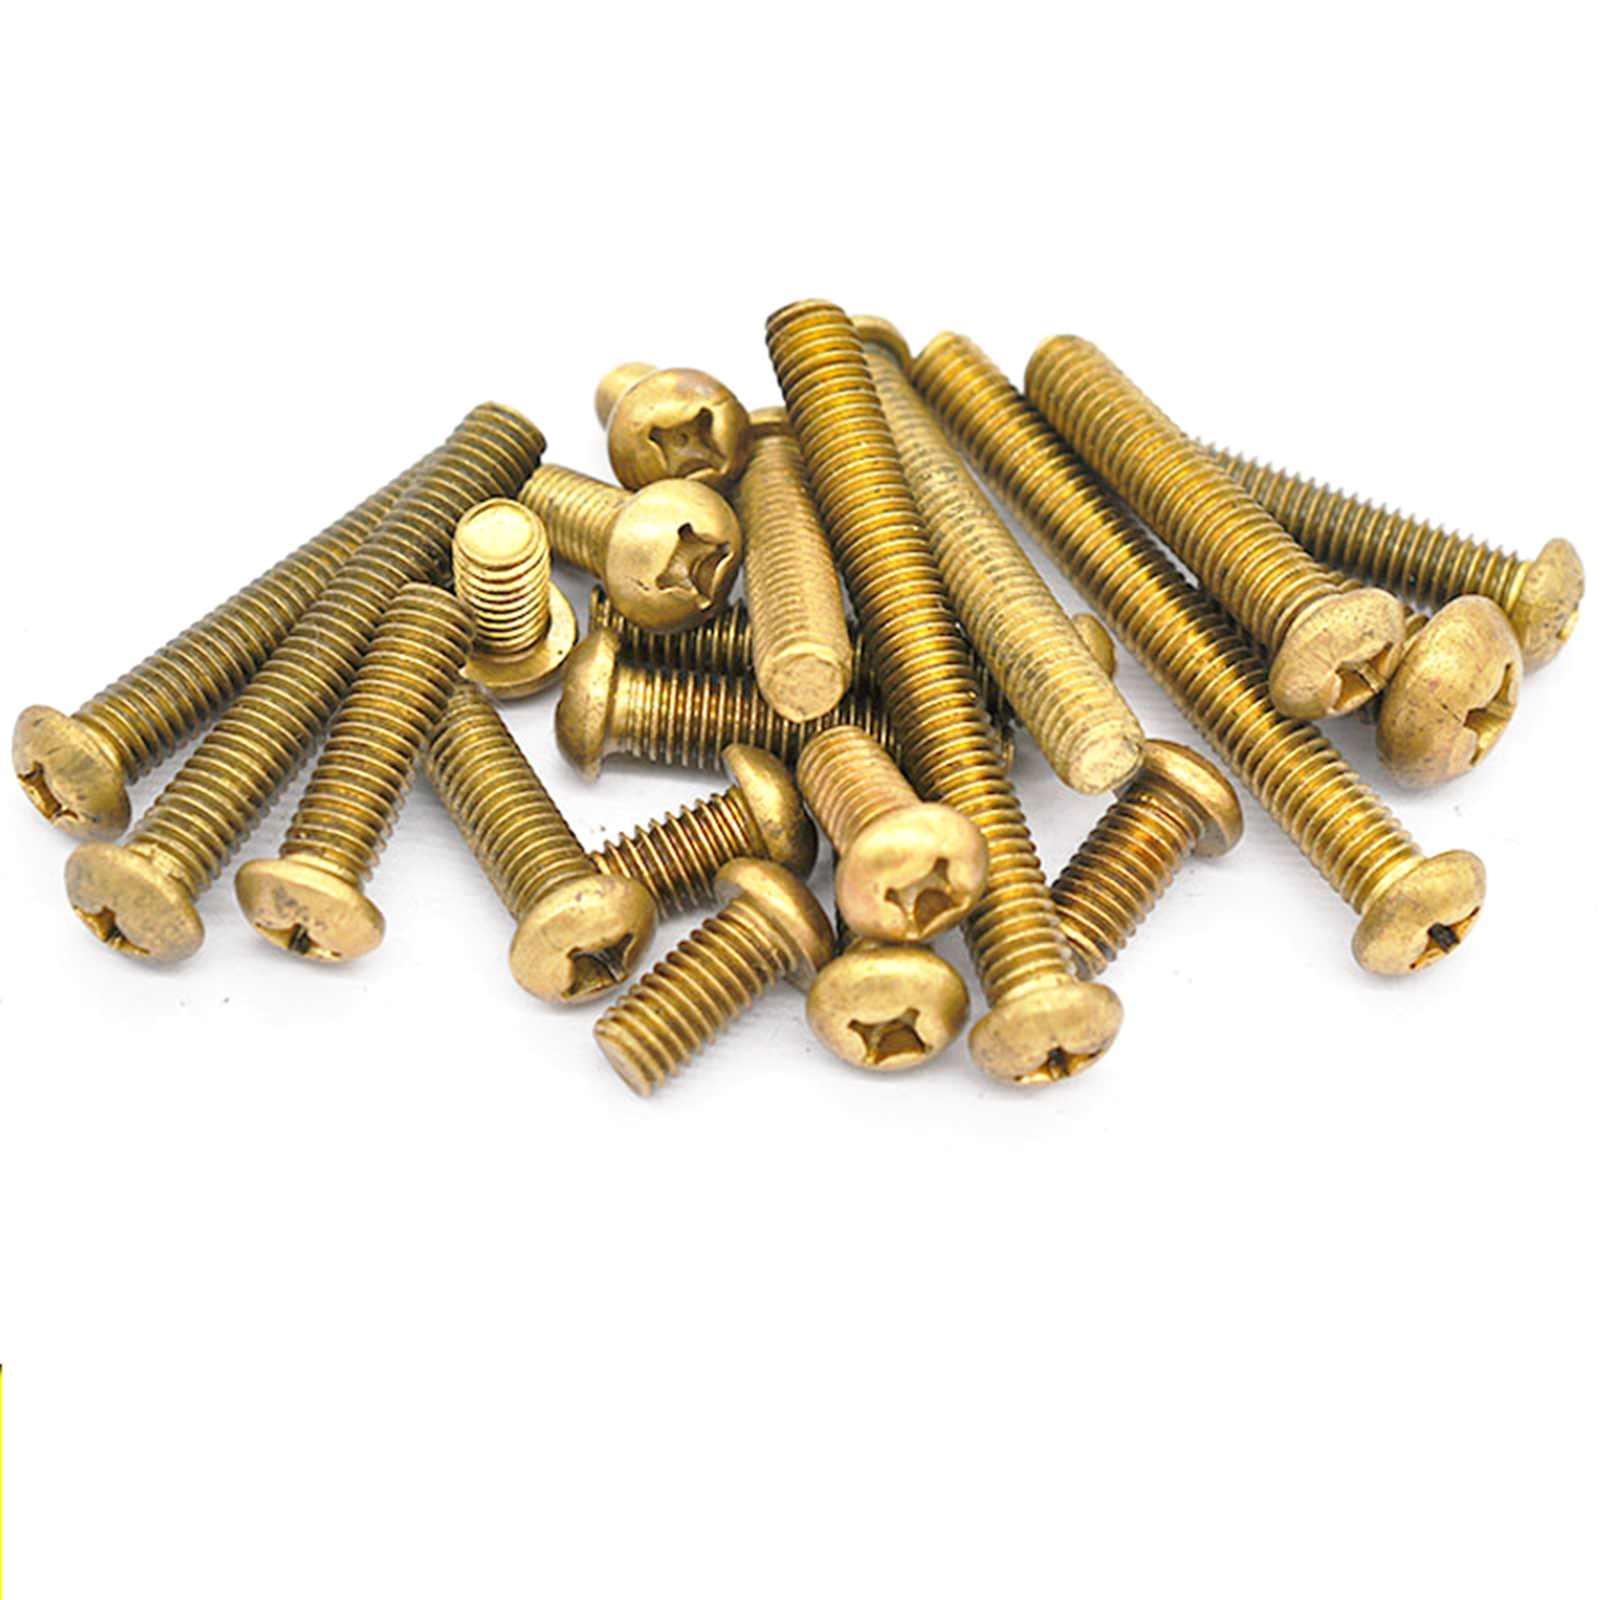 100pcs Metric Thread M4x10mm Brass Cross Recessed Phillips Pan Head Screw Bolt